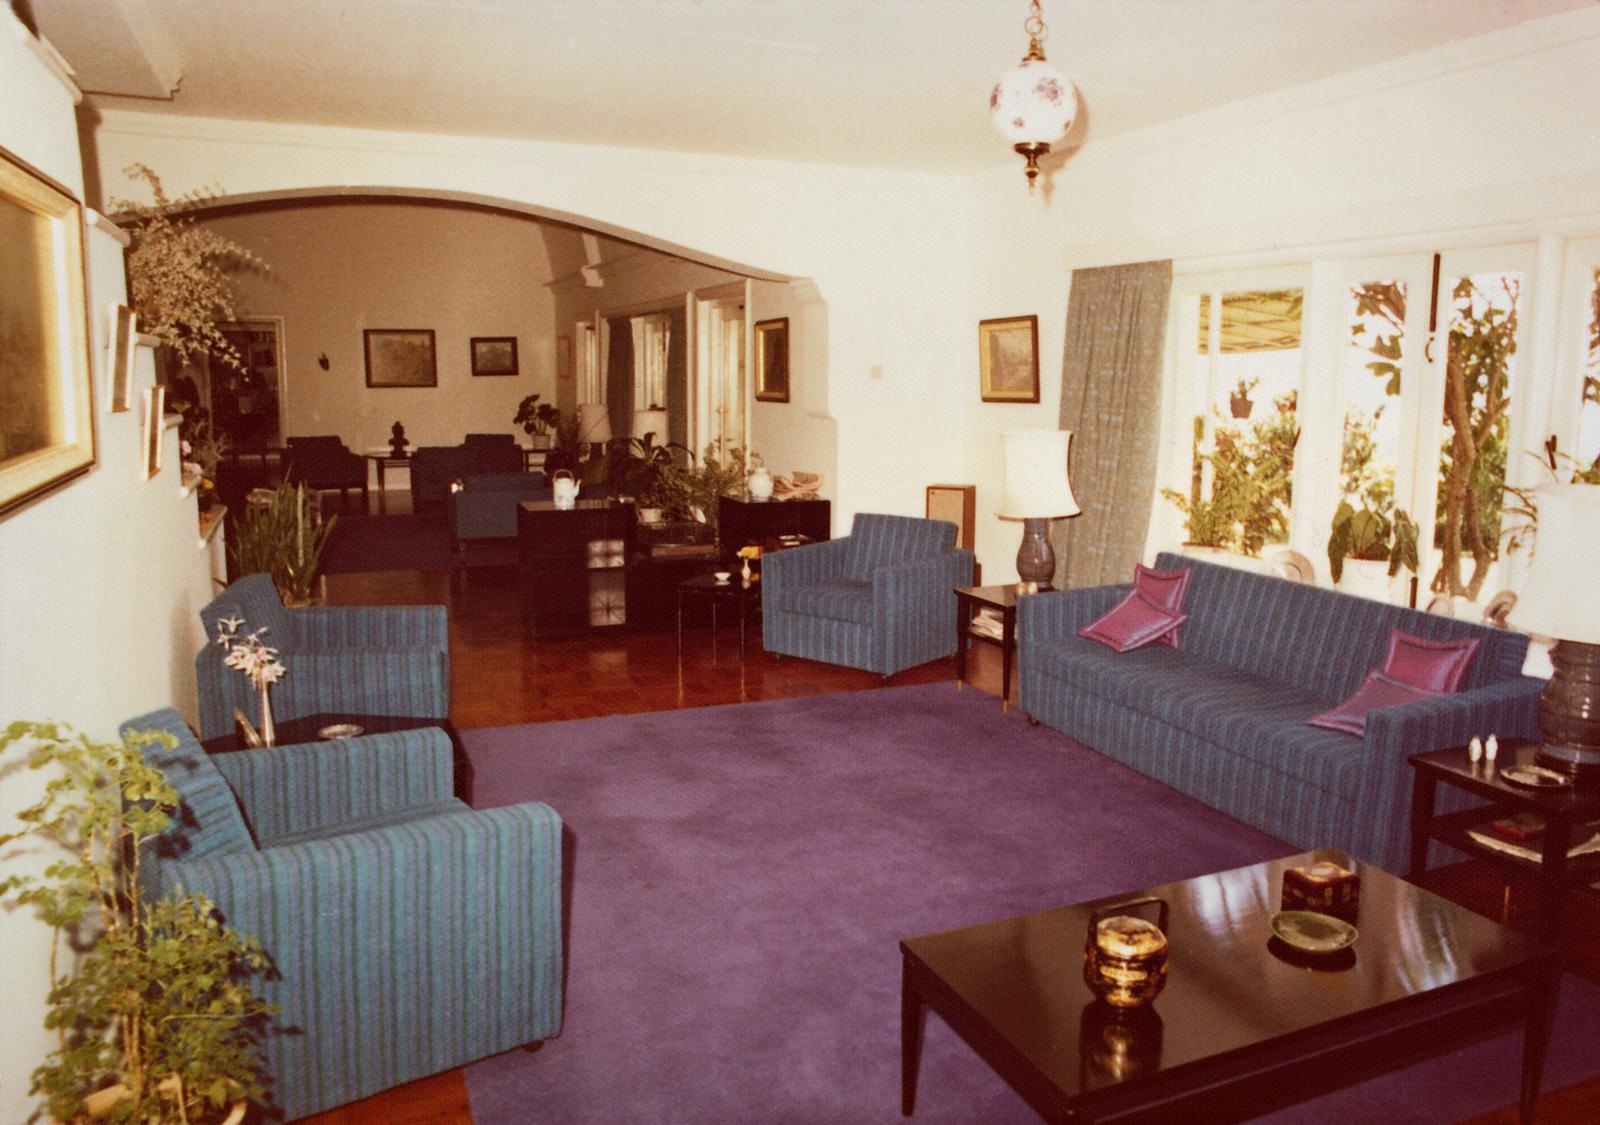 Kuala Lumpur - Mid-Level Position Residence - 1976